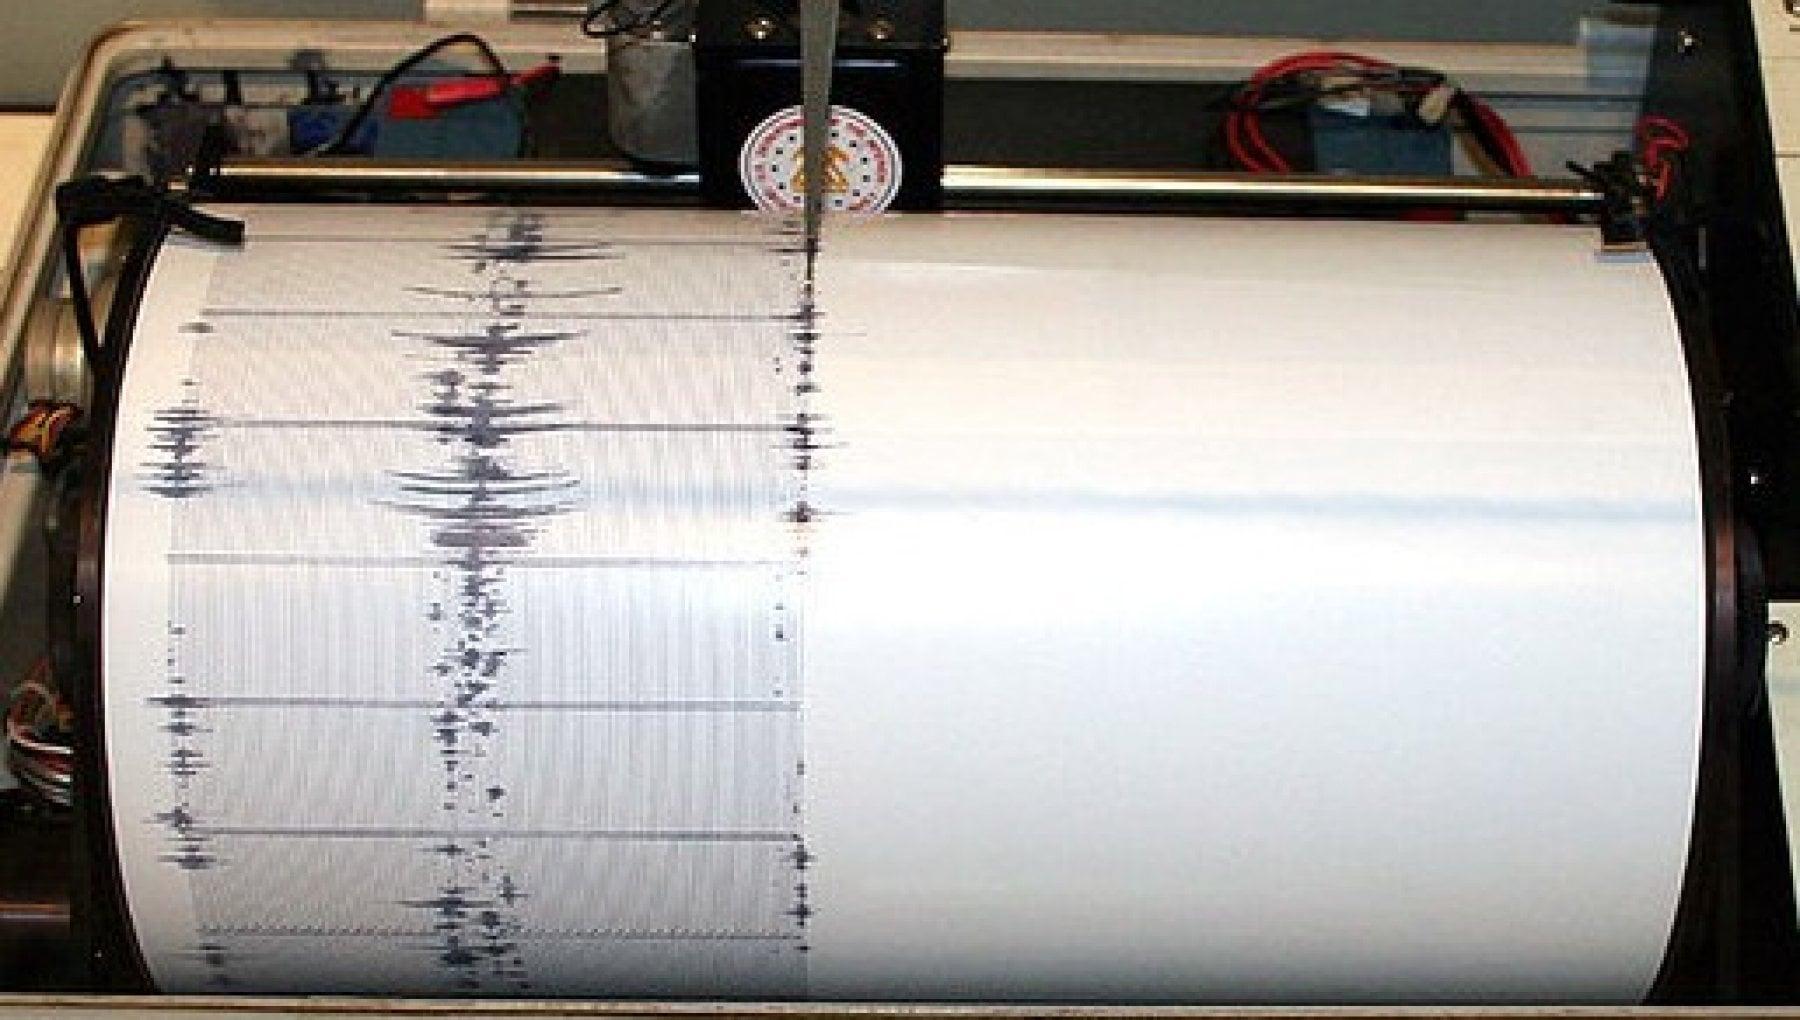 060555678 1c6892f9 94b5 4dc8 82aa a434d7cdf2ee - Terremoti: Argentina, scossa magnitudo 6 nel nordovest